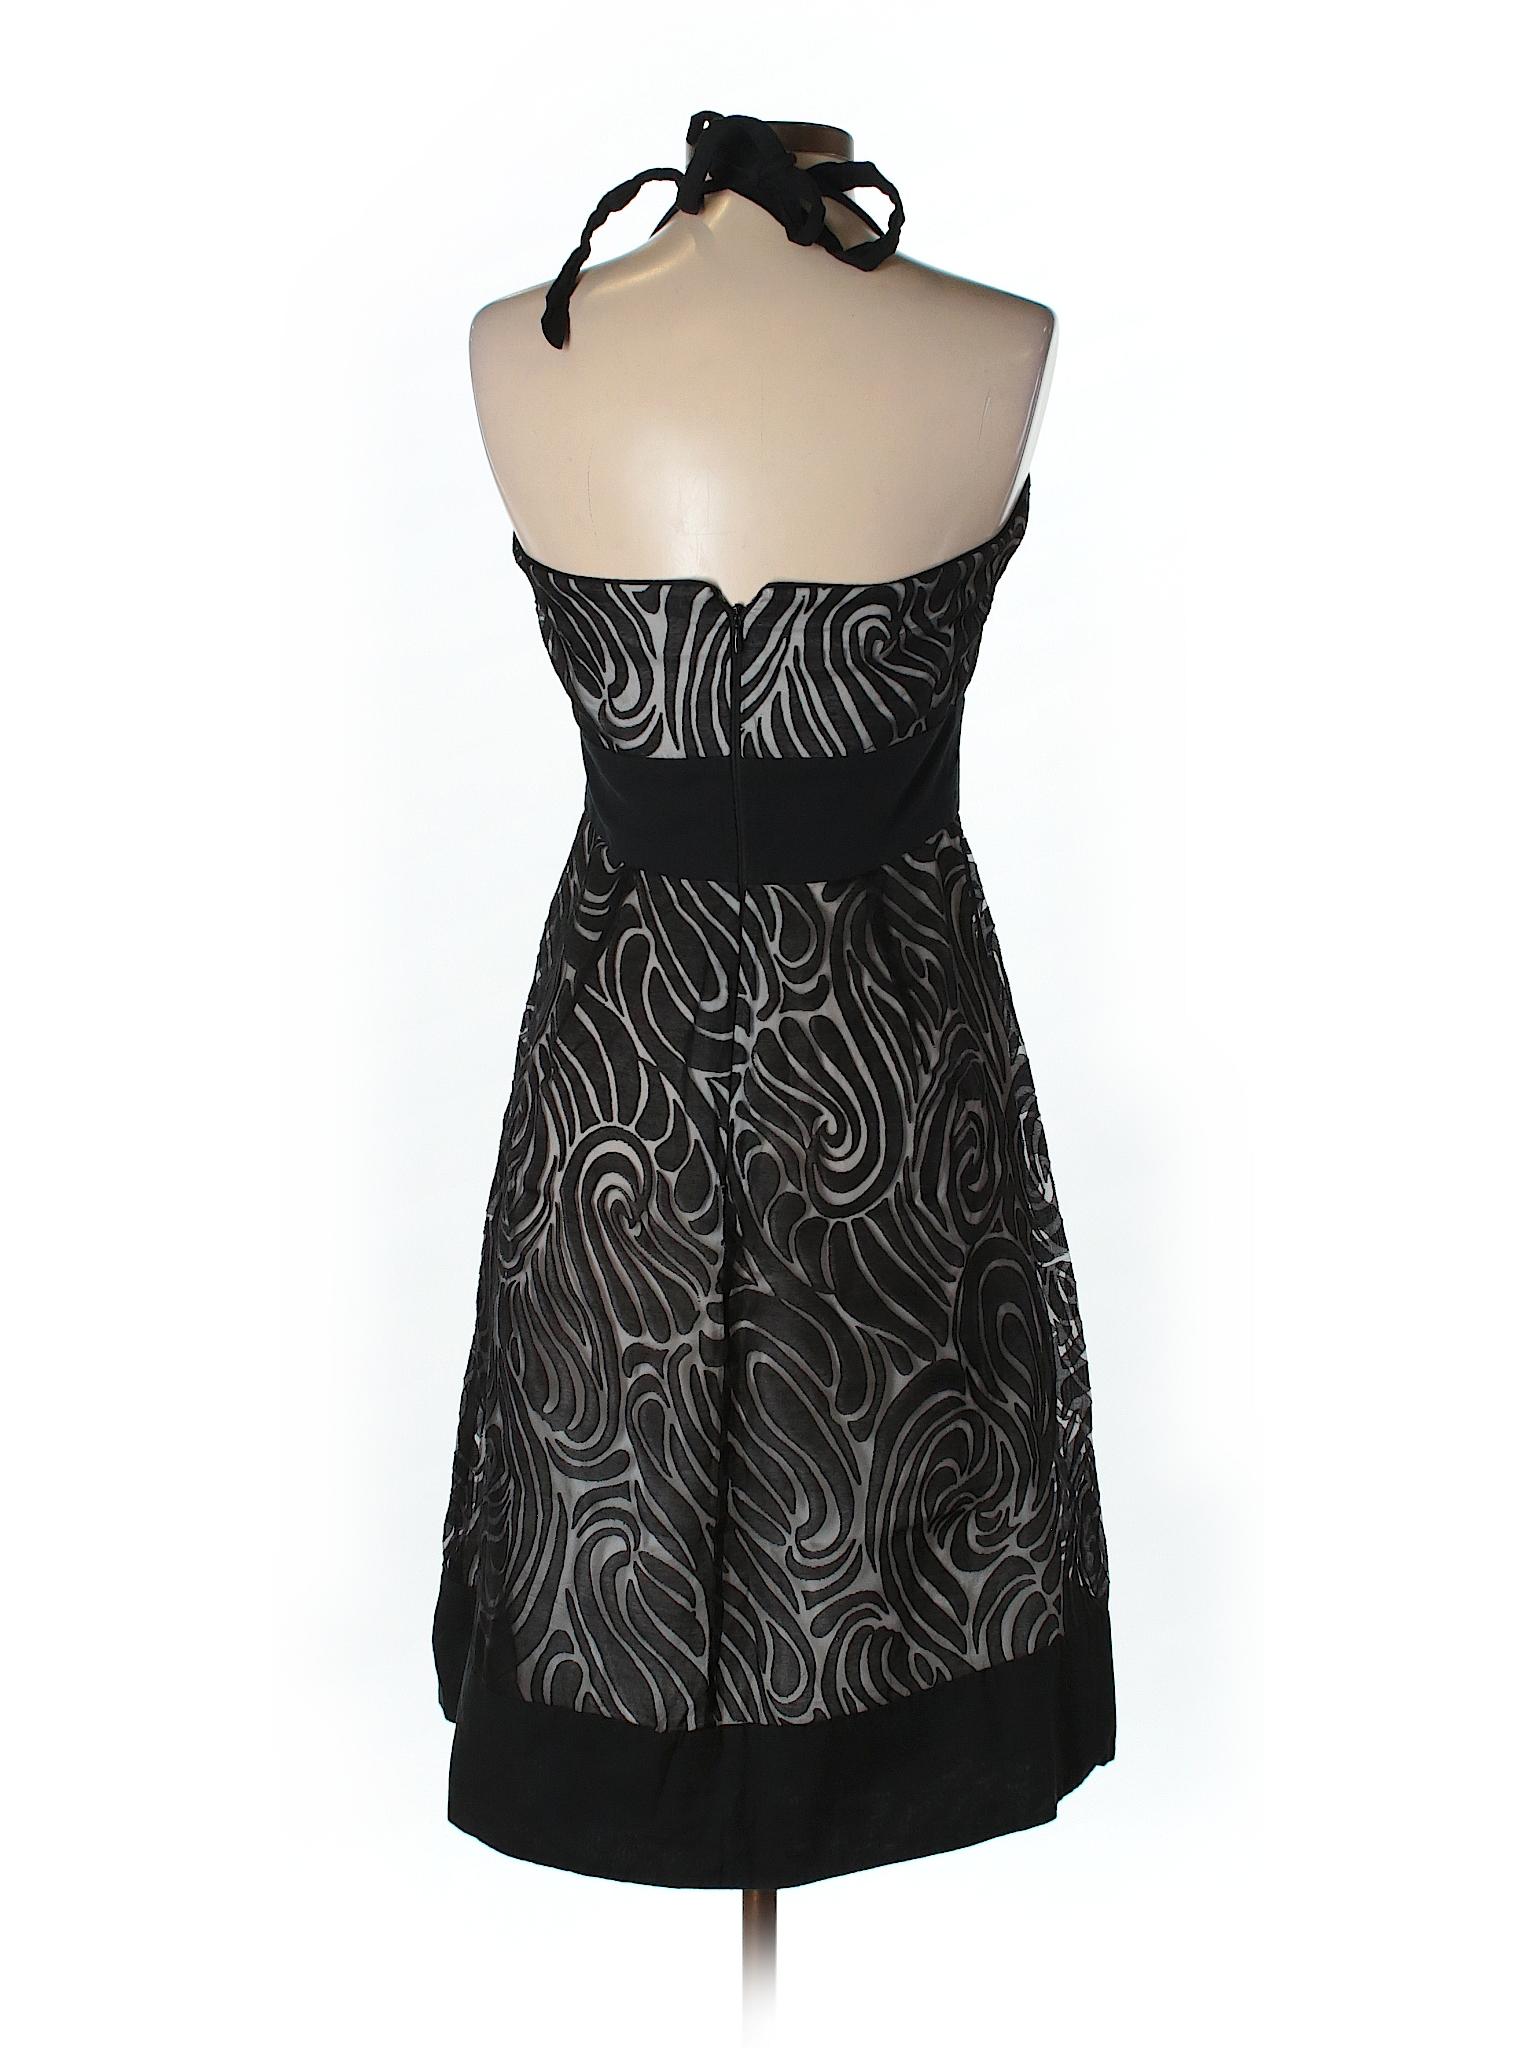 Market Dress Selling Casual Black White House 6nqBF